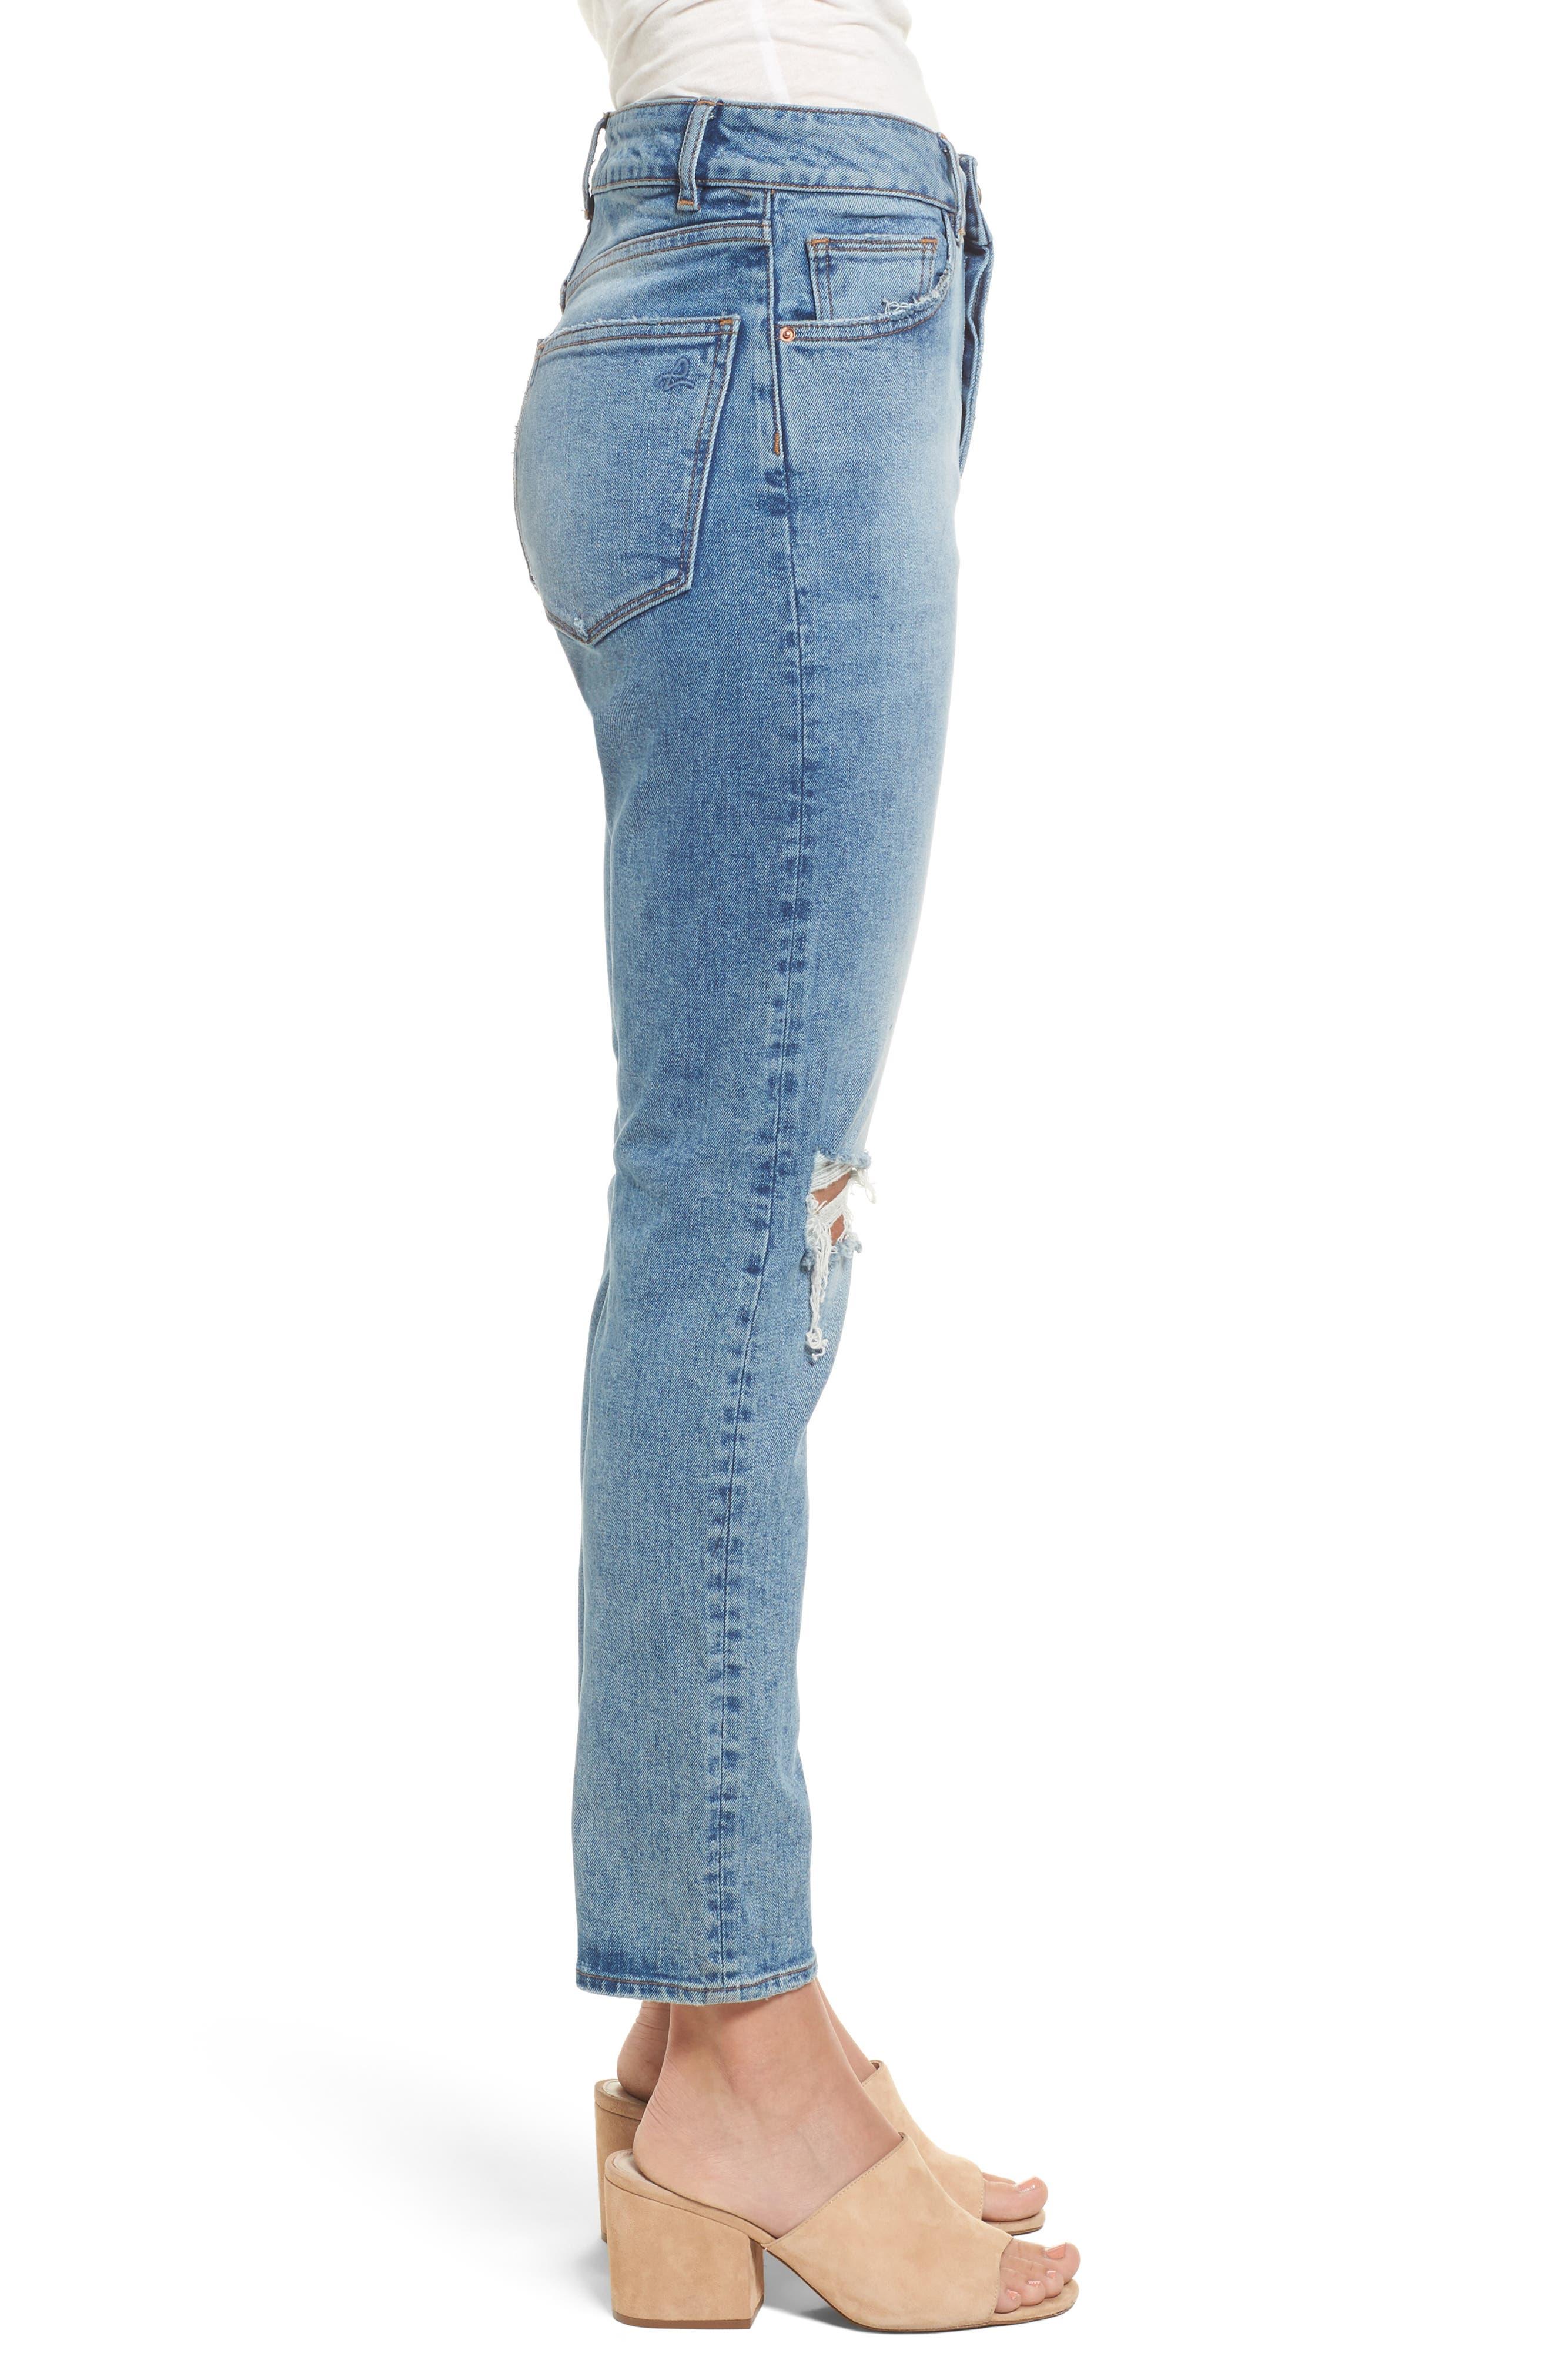 Bella Vintage Ankle Skinny Jeans,                             Alternate thumbnail 3, color,                             430